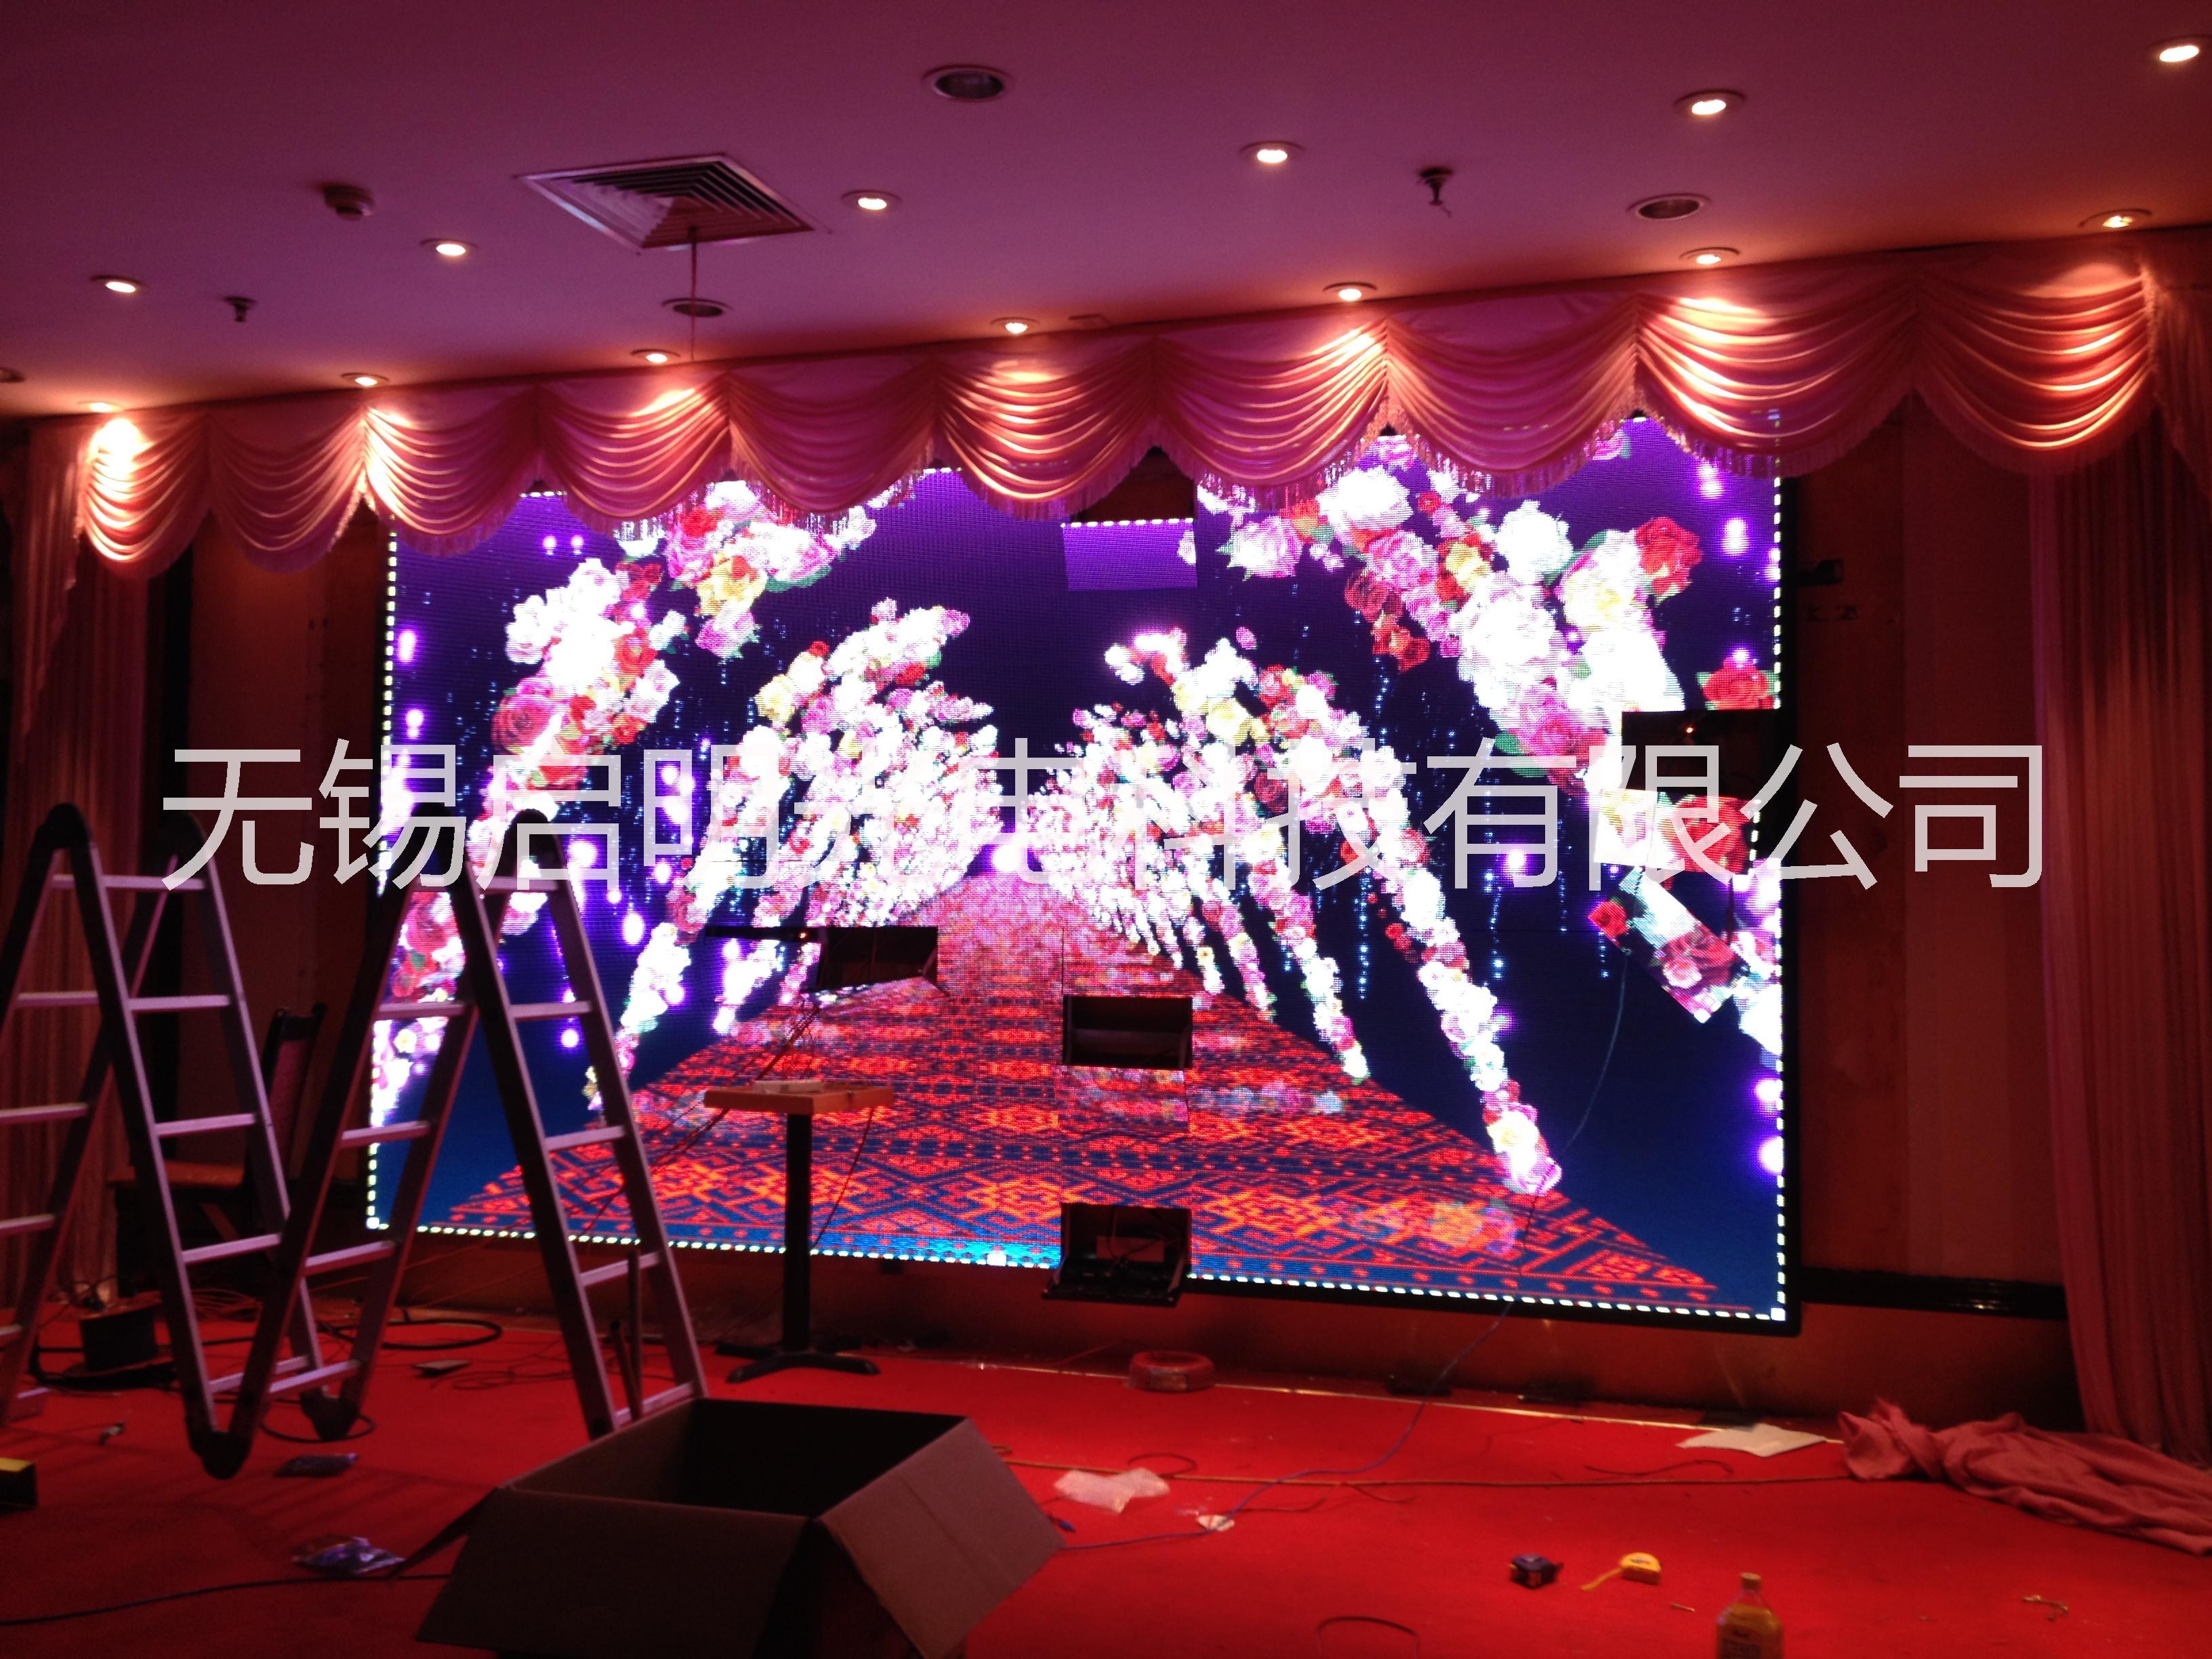 LED显示屏 室内LED全彩显示屏 LED显示屏室内LED全彩显示屏